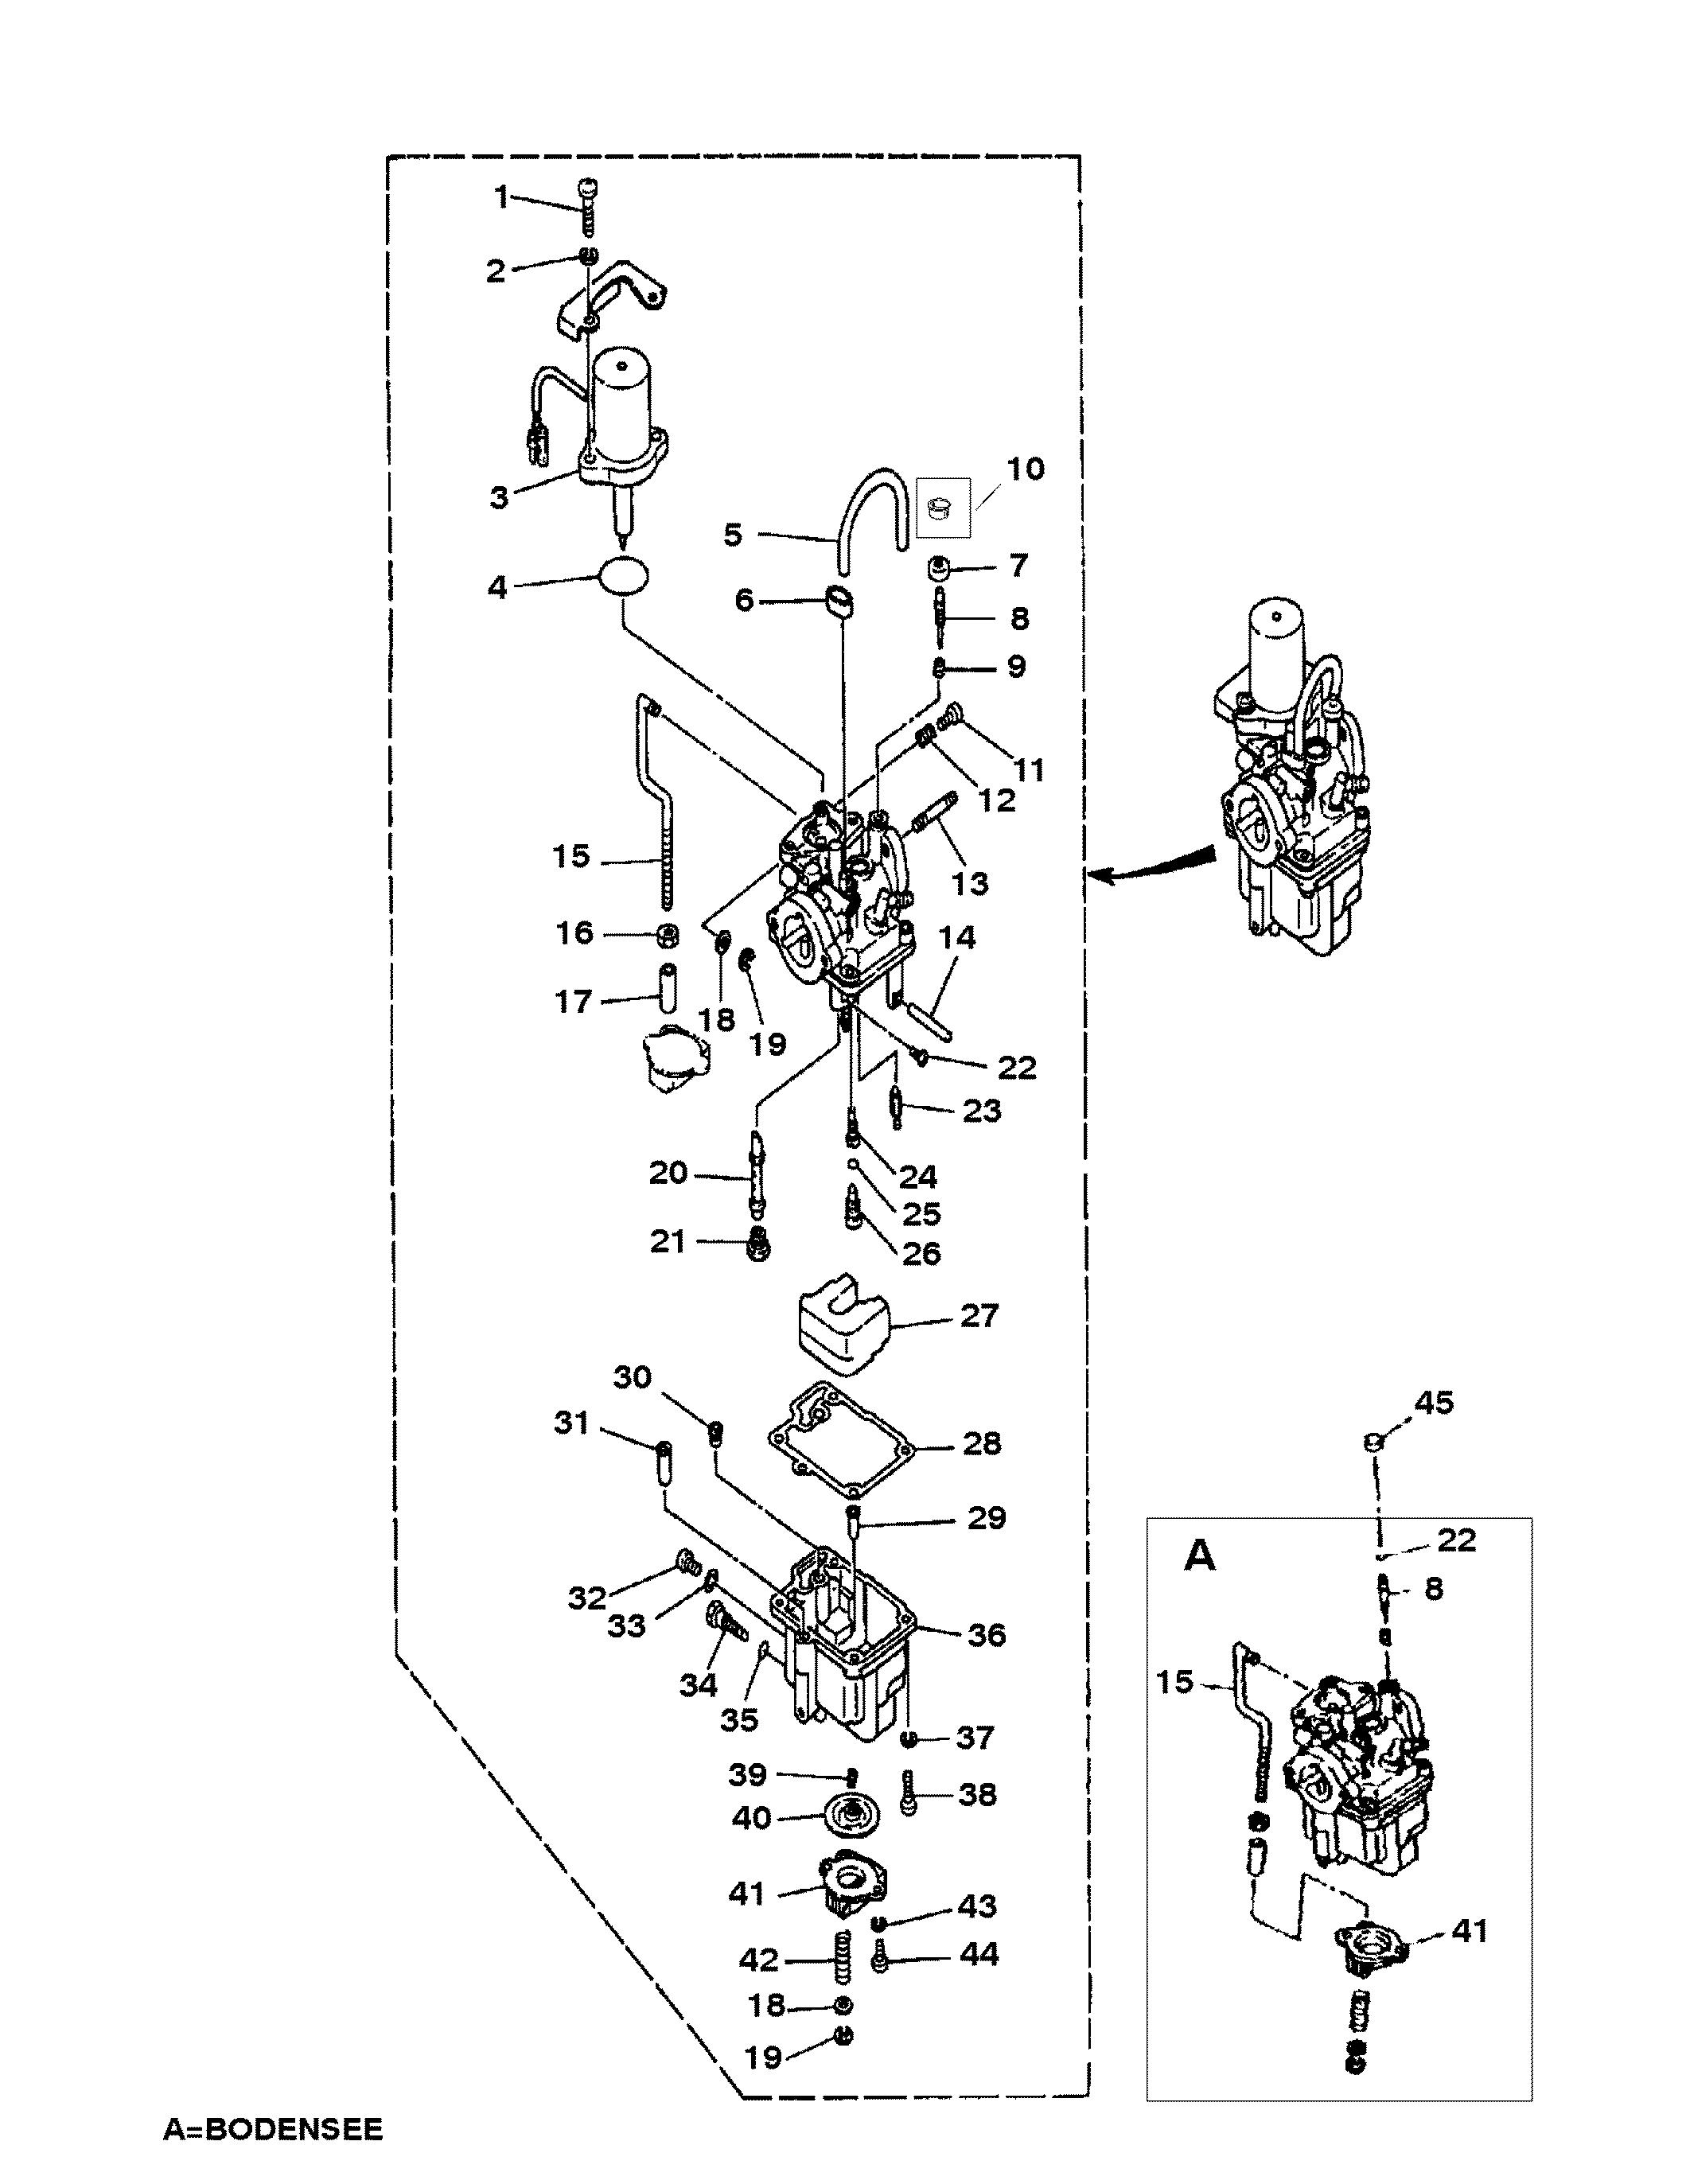 Printable Wiring Diagram For Mercury 9 9 Engine Ot